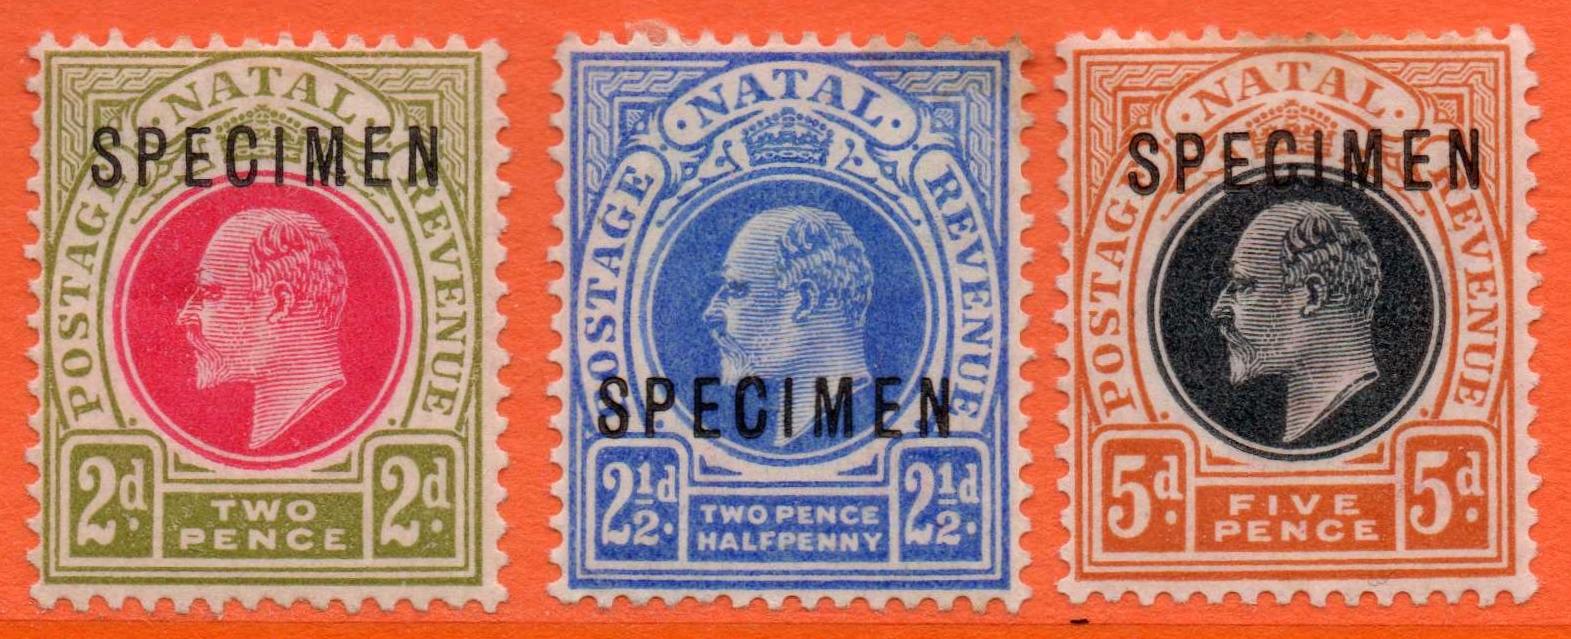 Natal Edward VII 1902-03 SPECIMENS (Three Values)